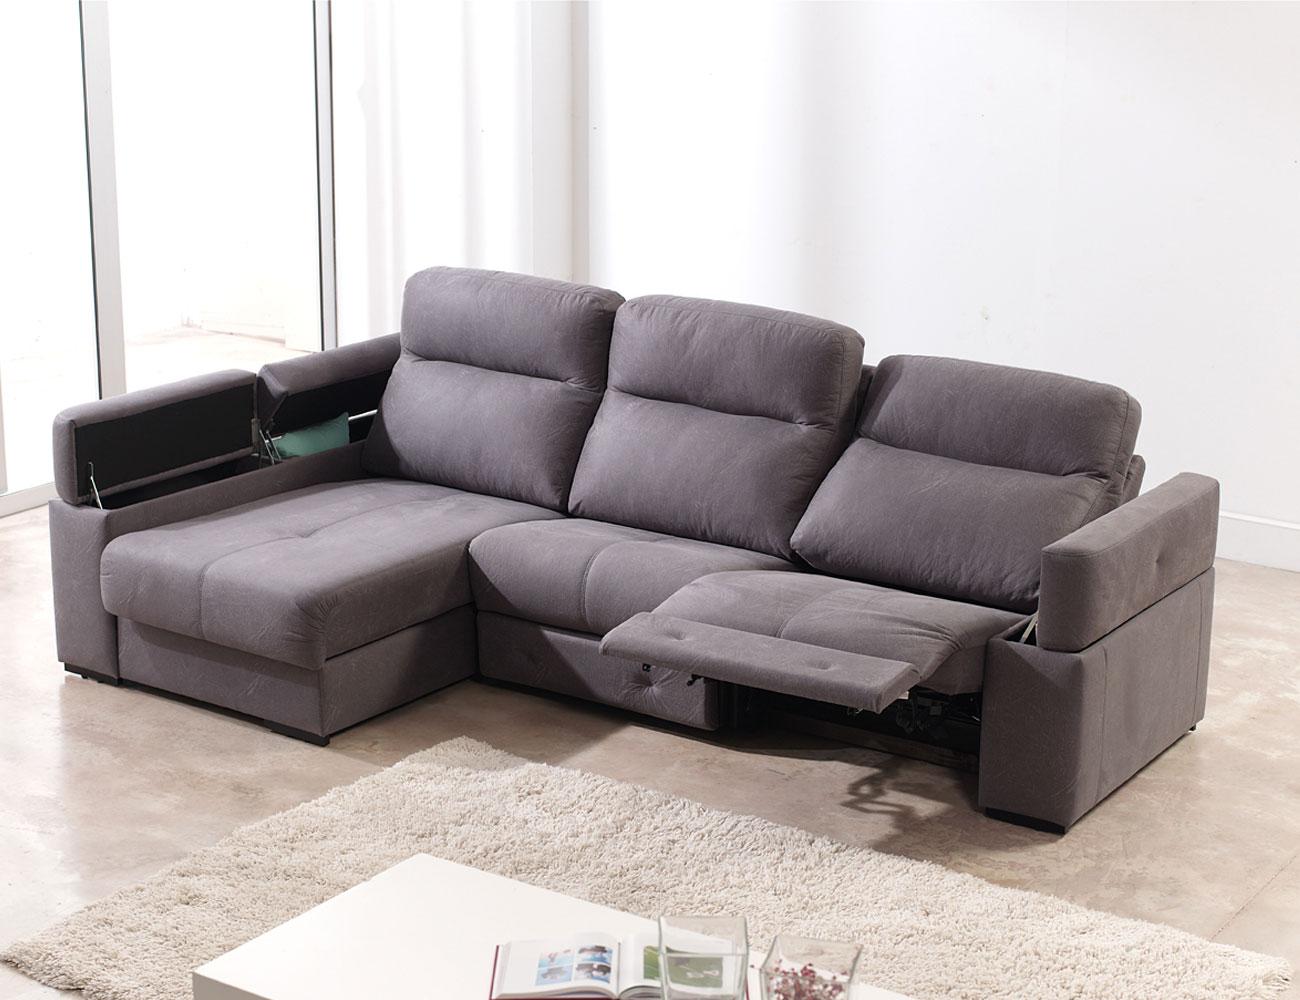 Sofa chaiselongue relax motor electrico 3 arcon 1